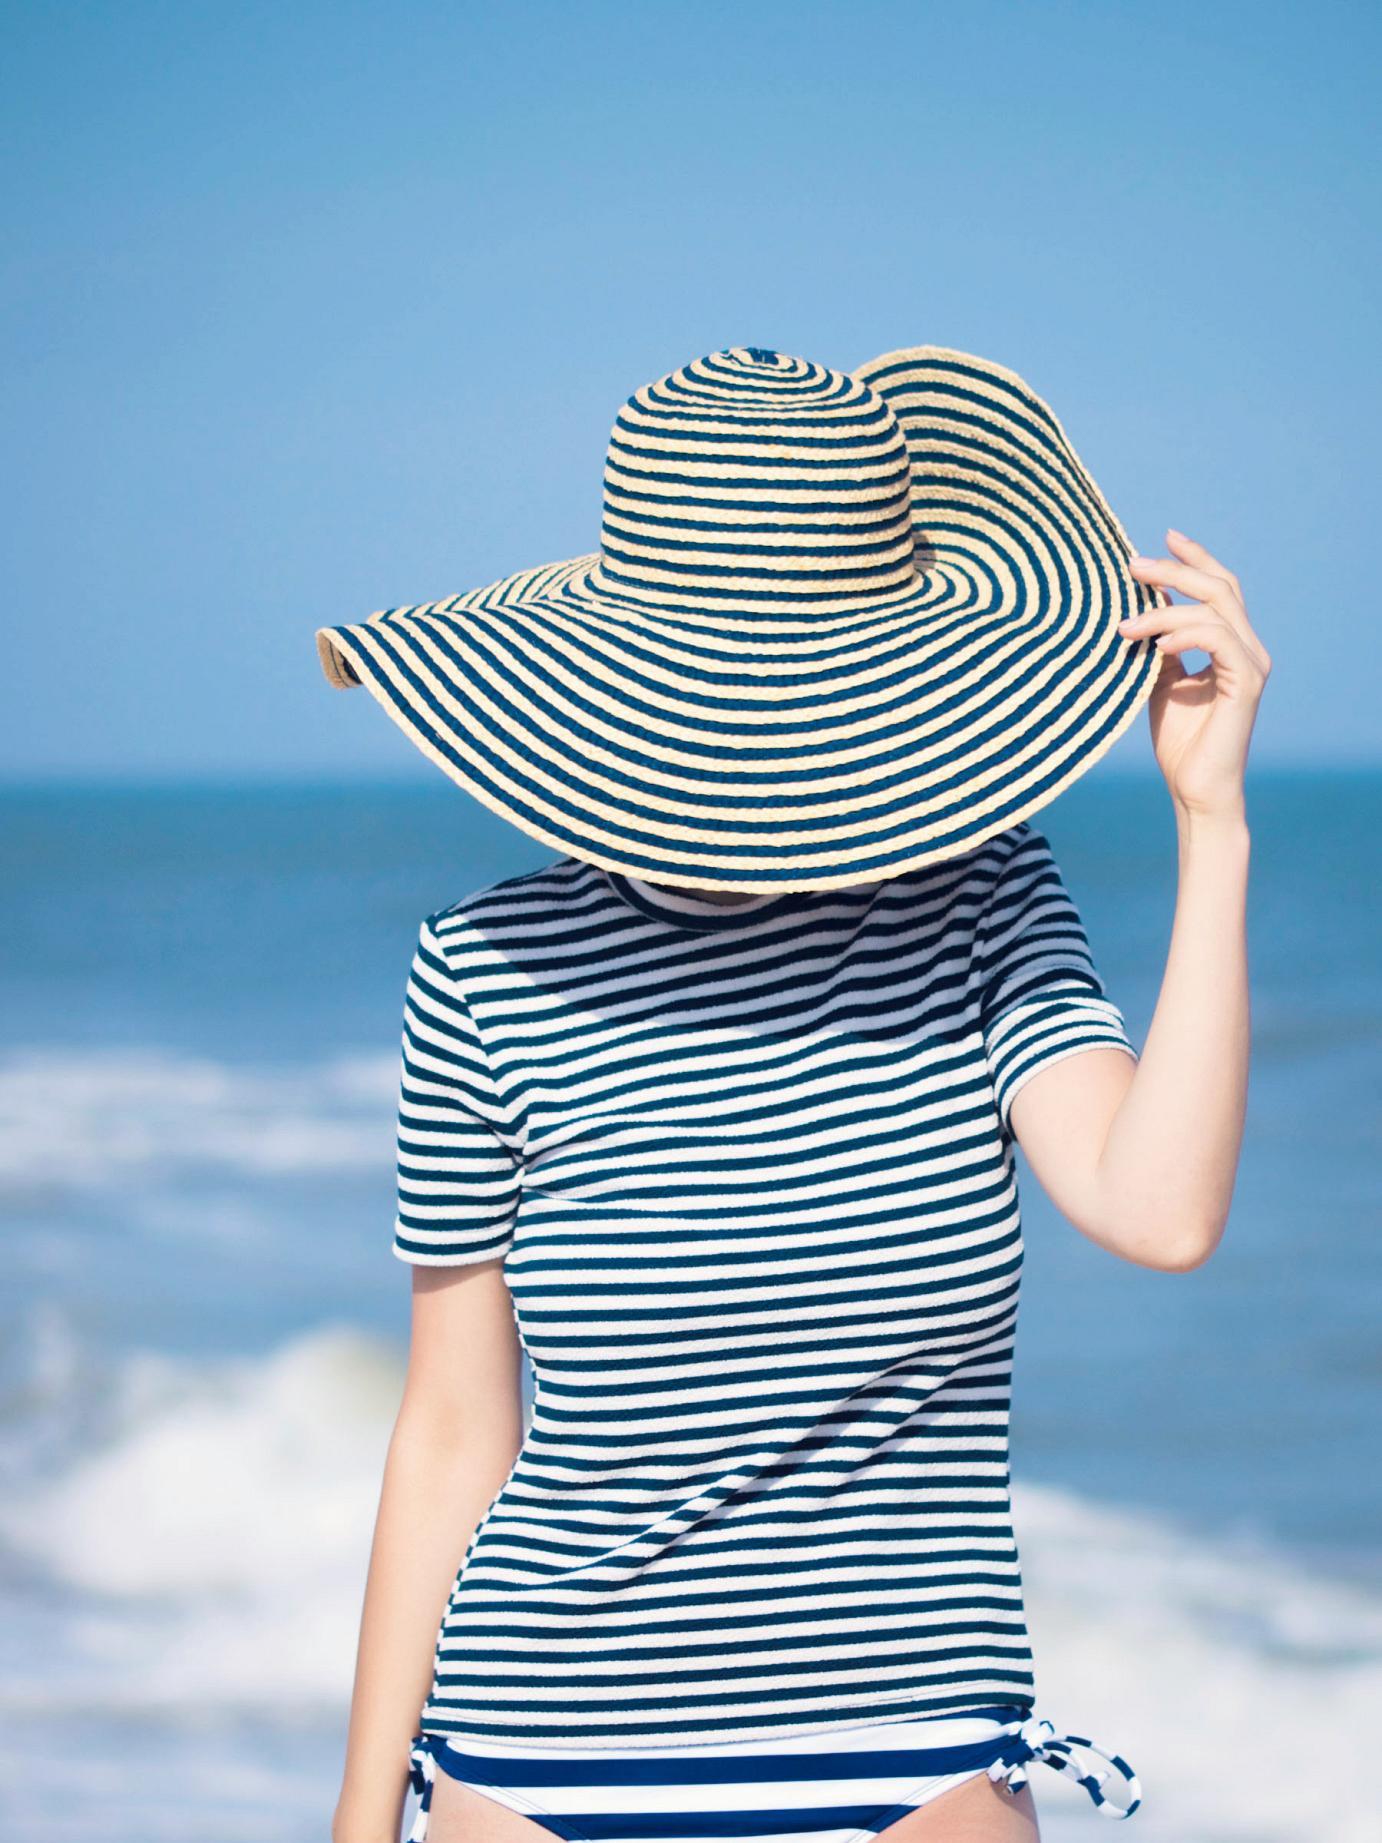 bittersweet colours, stripes, summer stripes, calvin klein, fedora hat, long beach island nj, summer, stripes on stripes